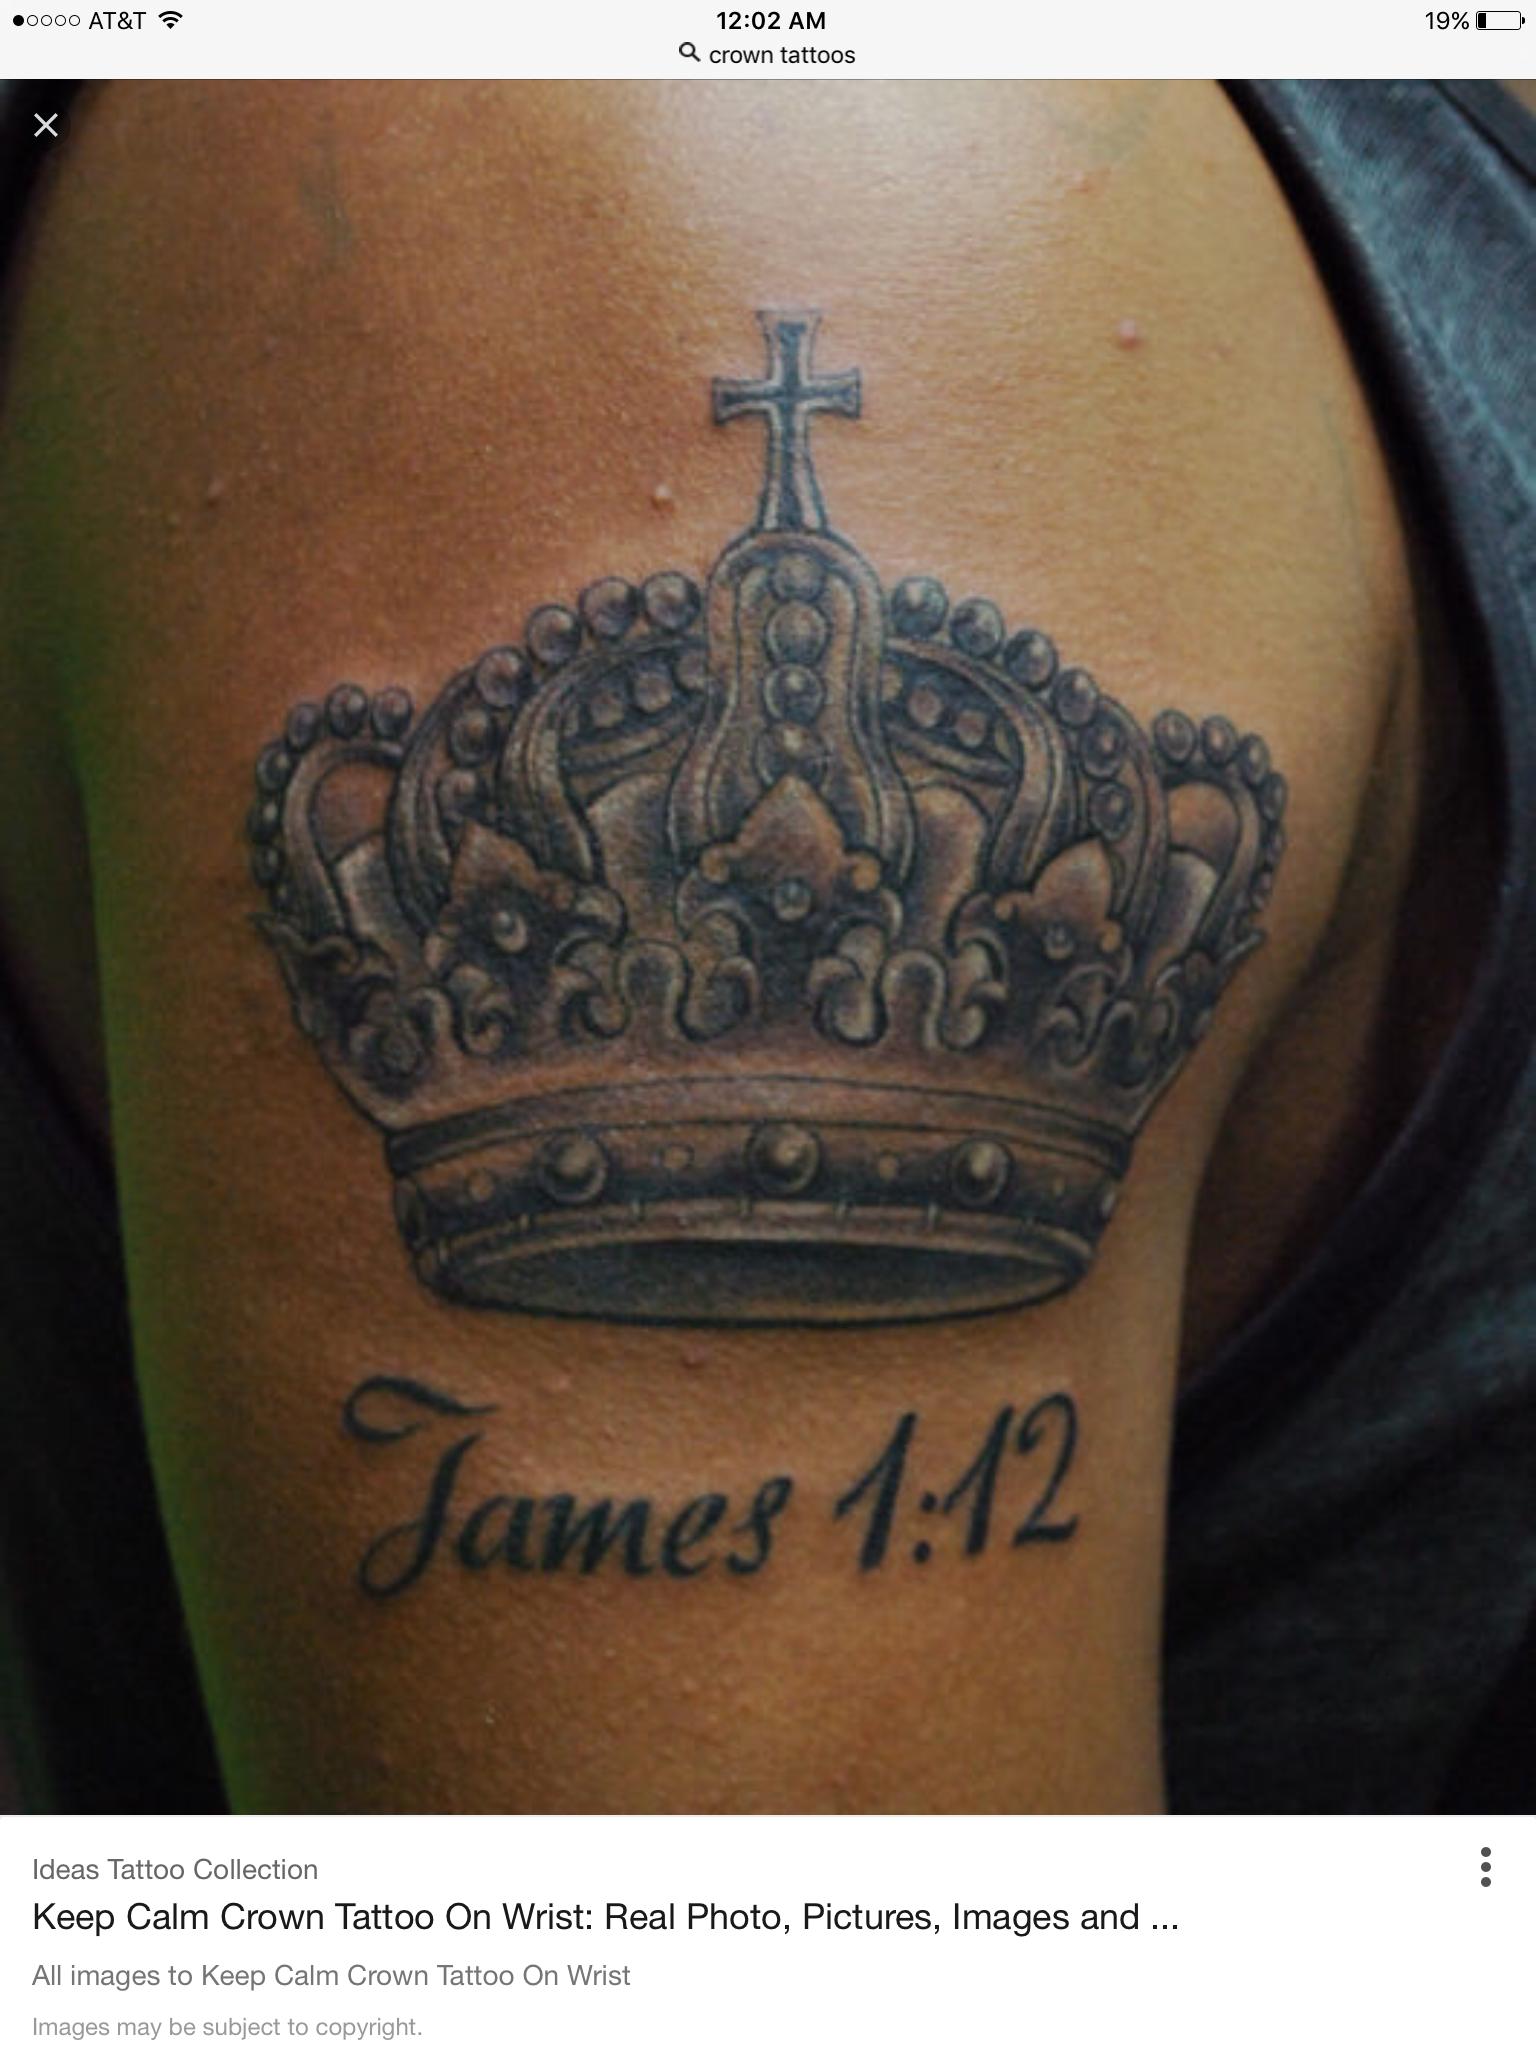 Pin by robin paboojian on tattoo ideas pinterest tattoo for Latin kings crown tattoo